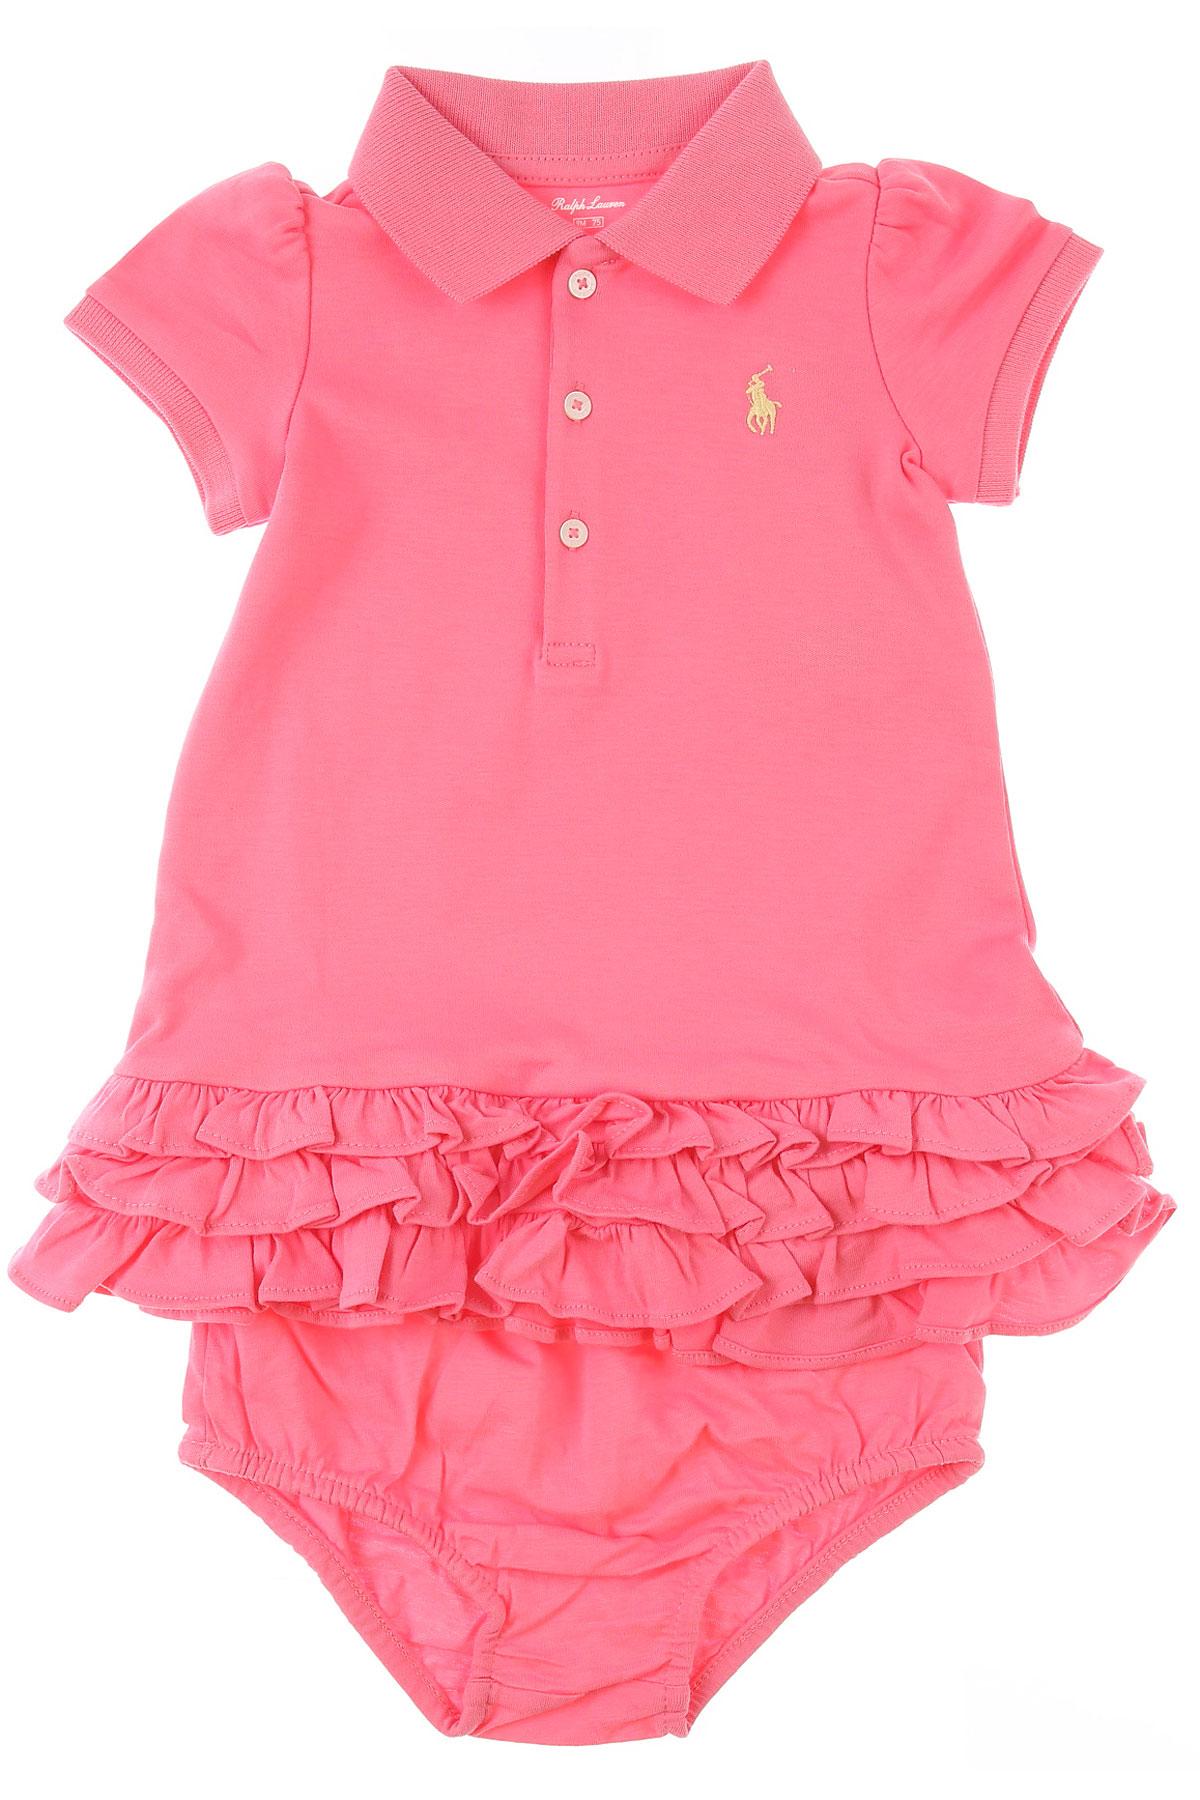 Ralph Lauren Baby Dress for Girls On Sale, Hot Pink, Cotton, 2019, 3M 9M